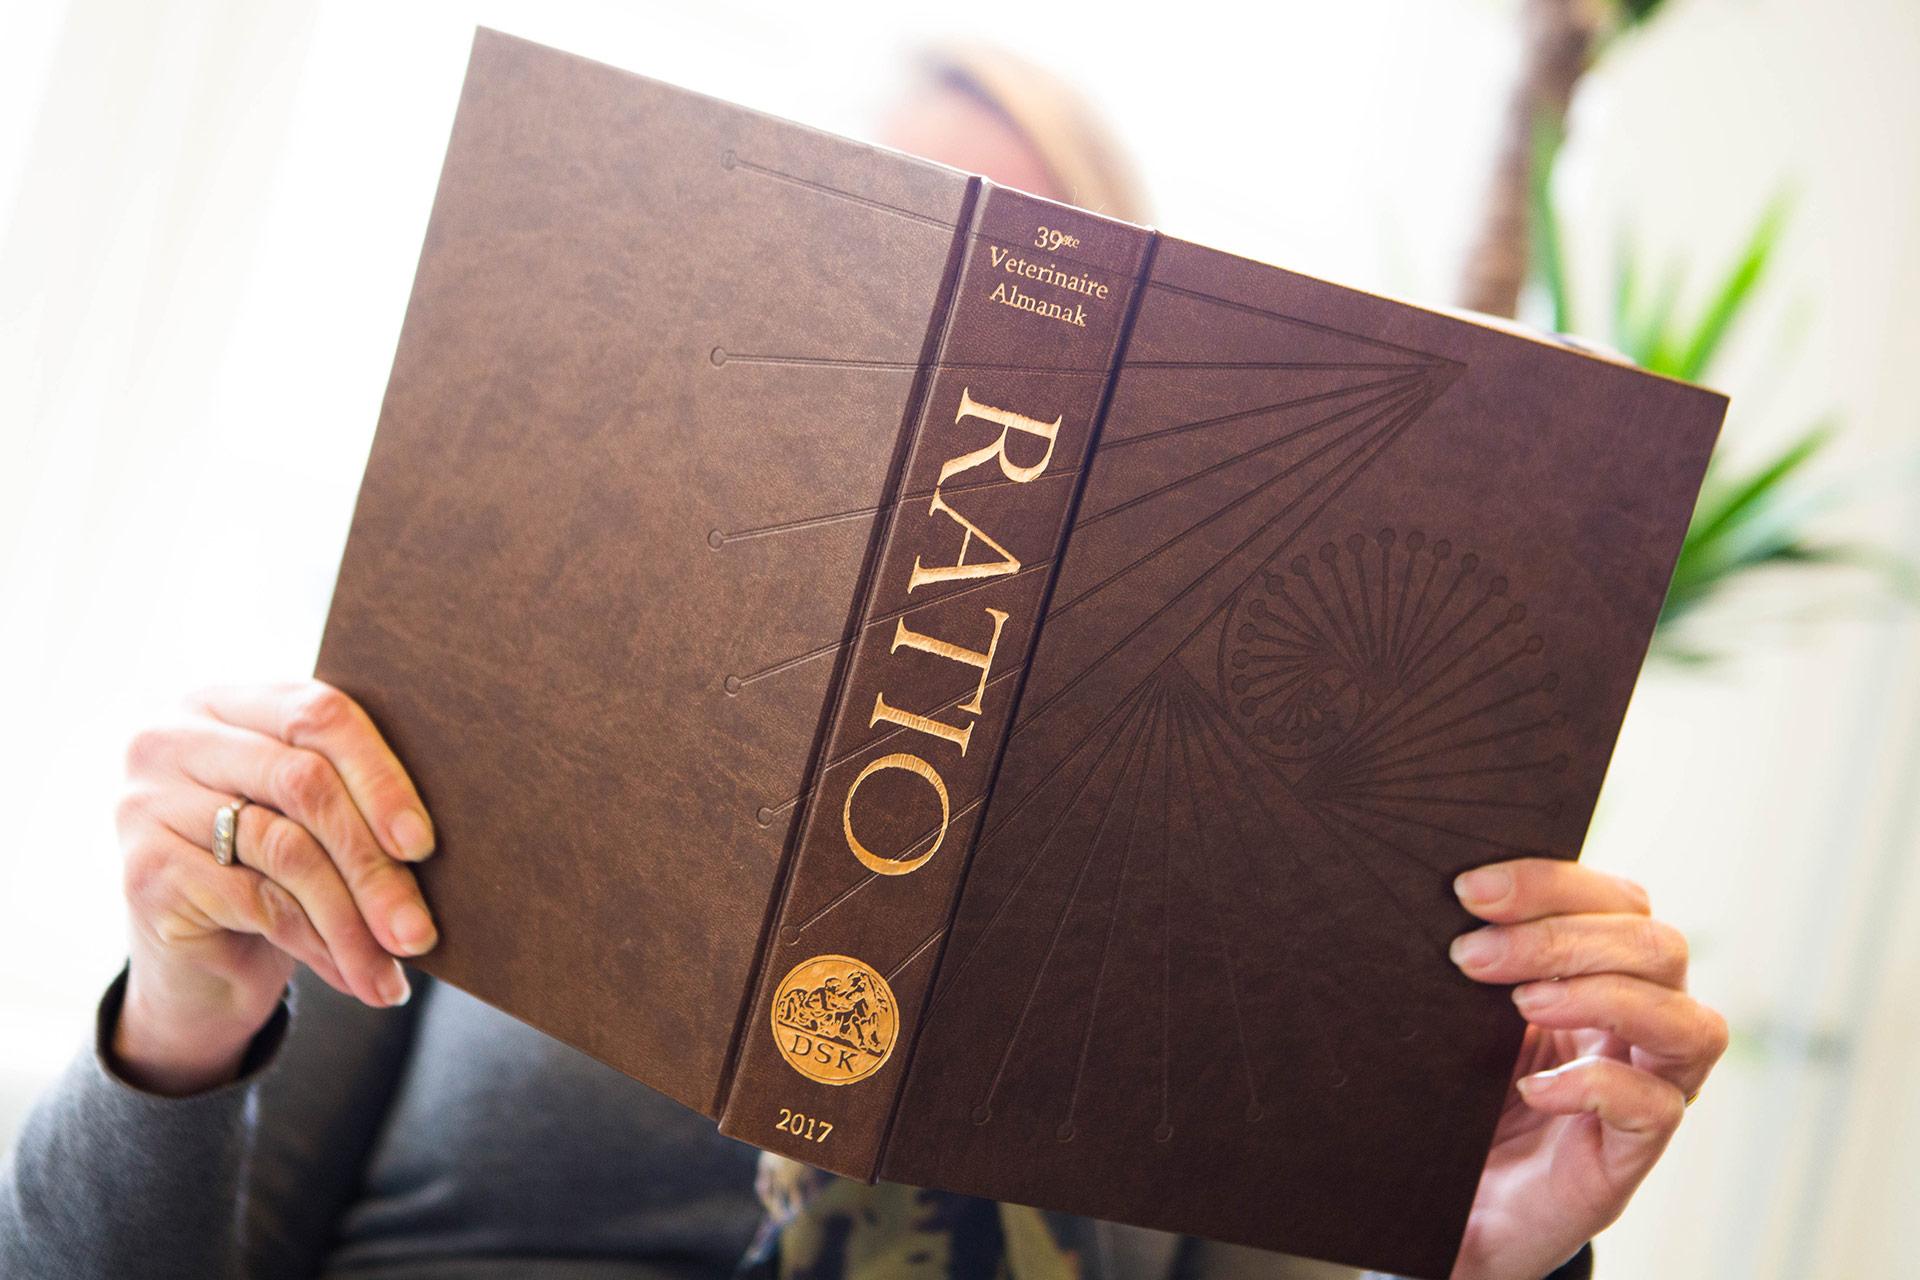 PerfectBook - Almanak met blindpreeg en goudfoliedruk op kunstleer